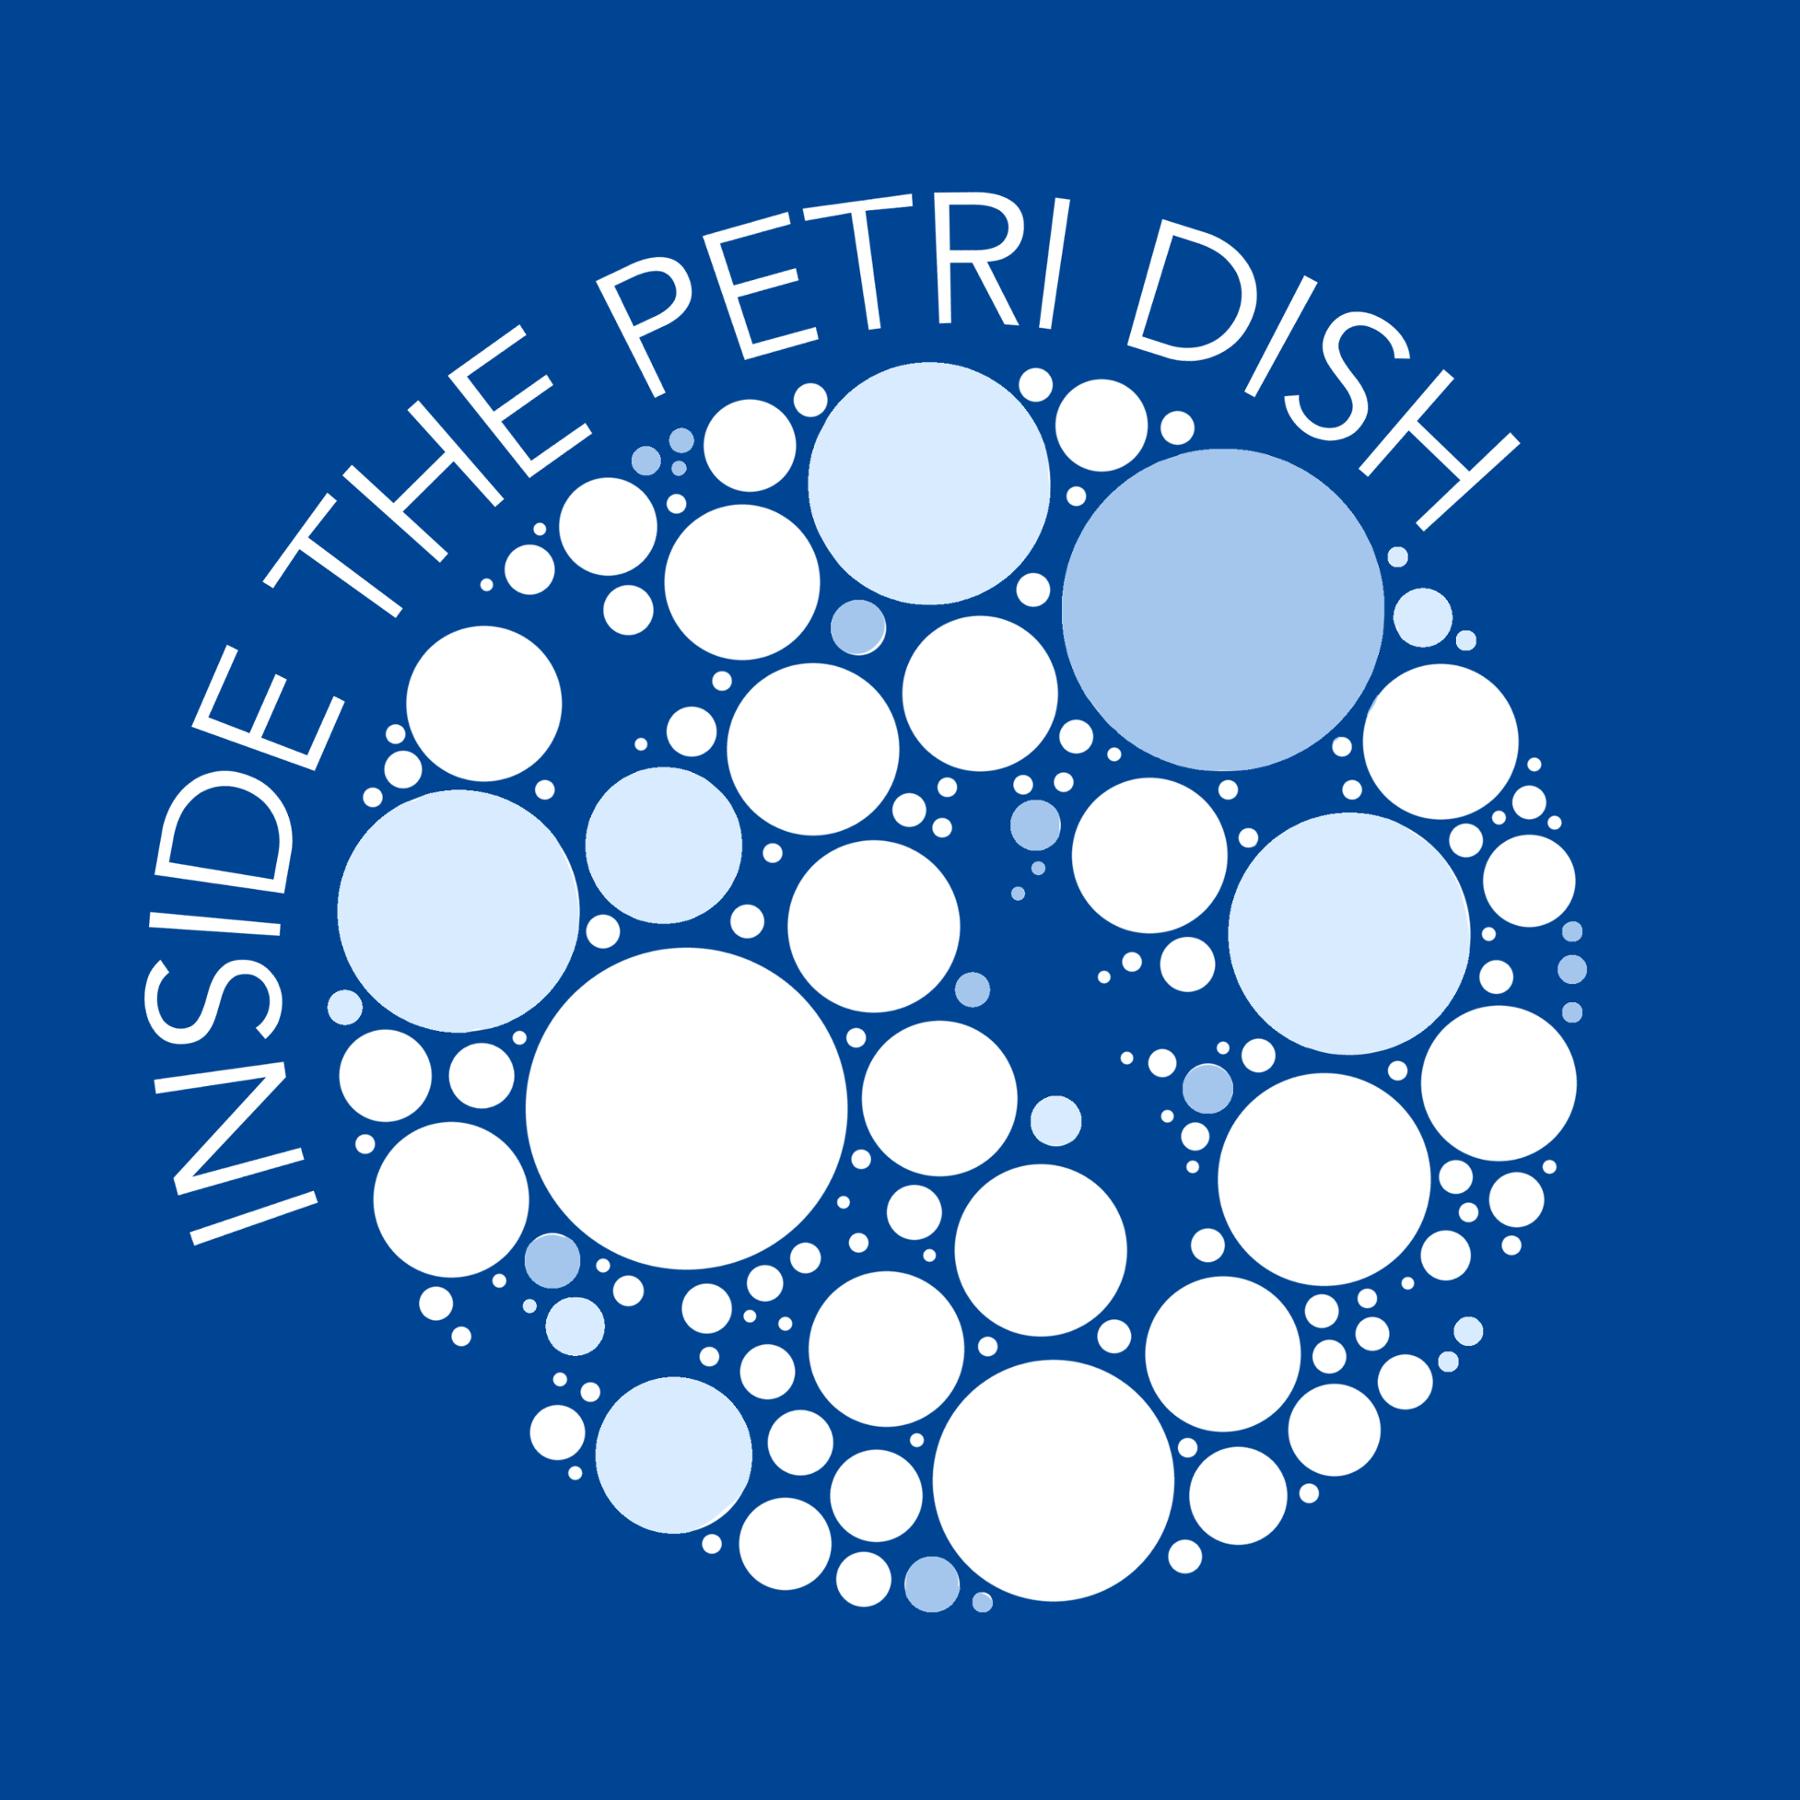 ITUNES-ITPD.png